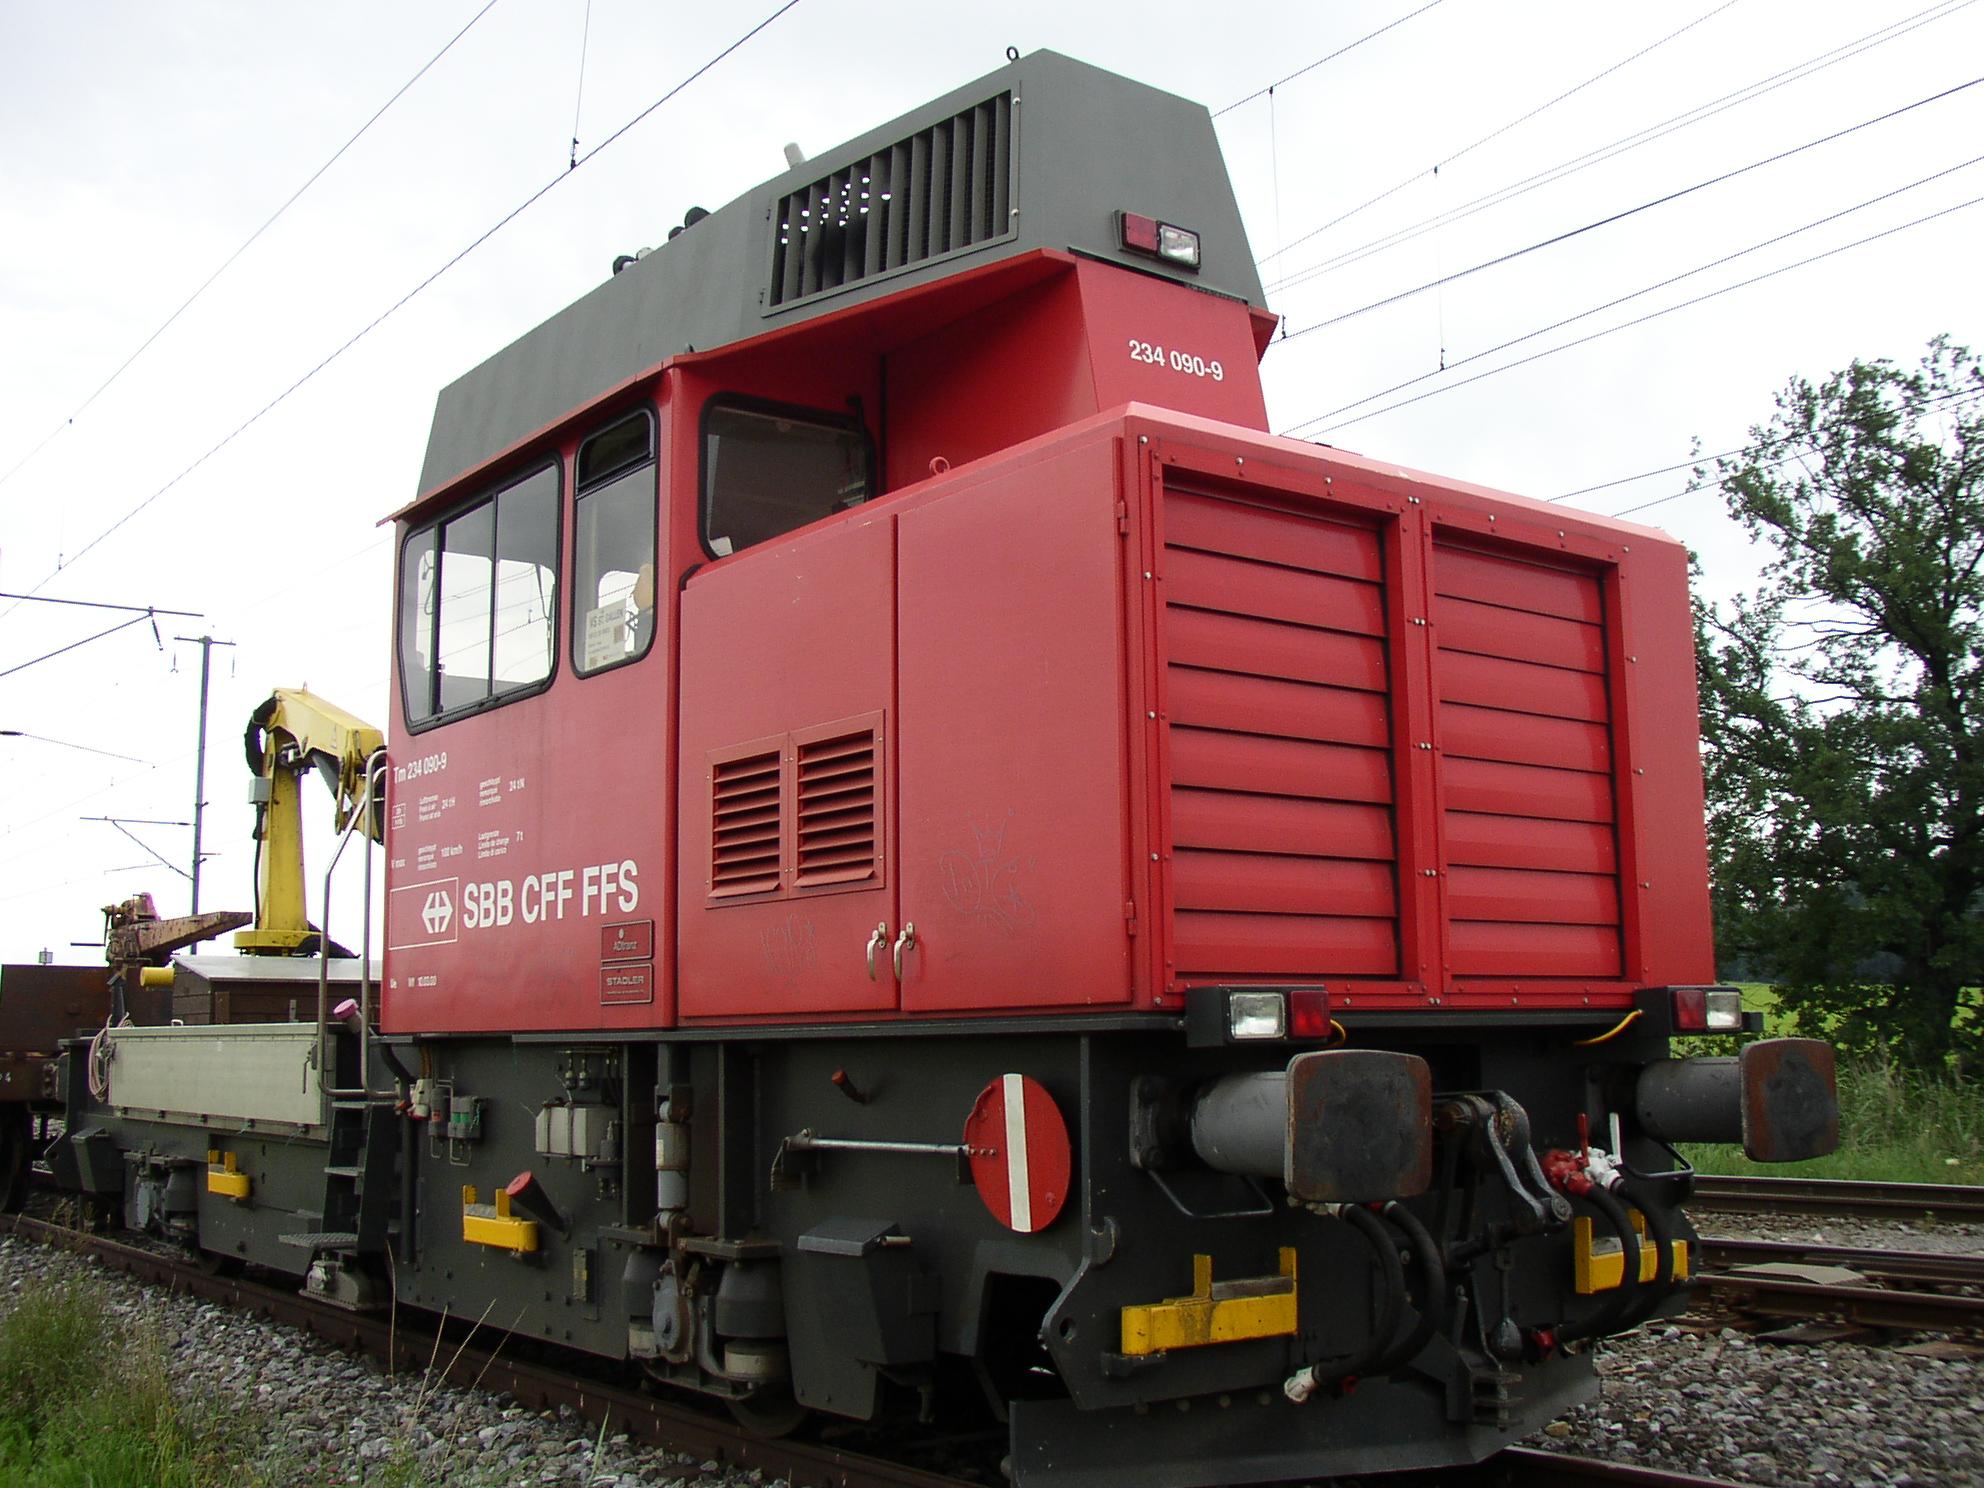 Tm 234